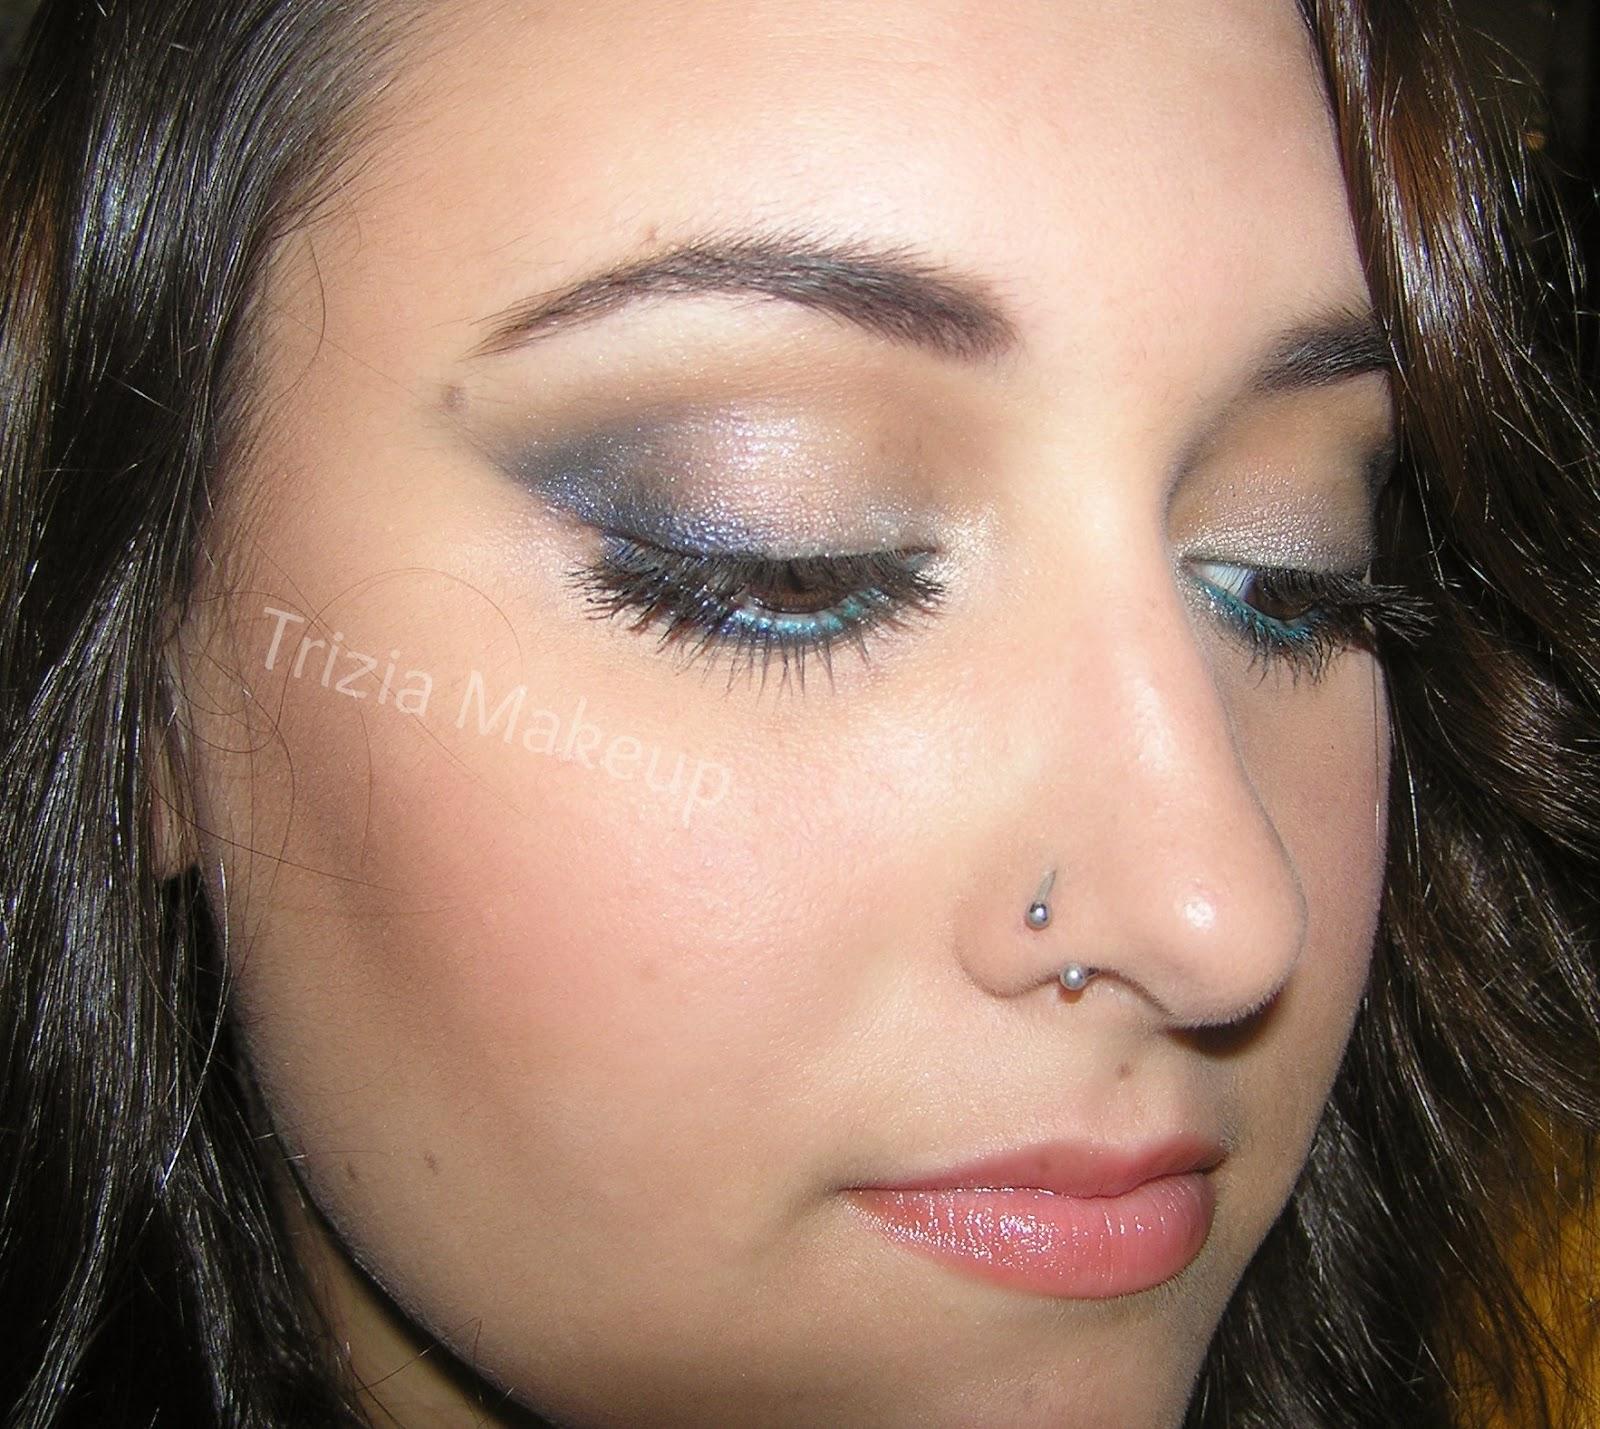 Patricia mar a maquillaje noche de verano en tonos azules - Tonos azules ...